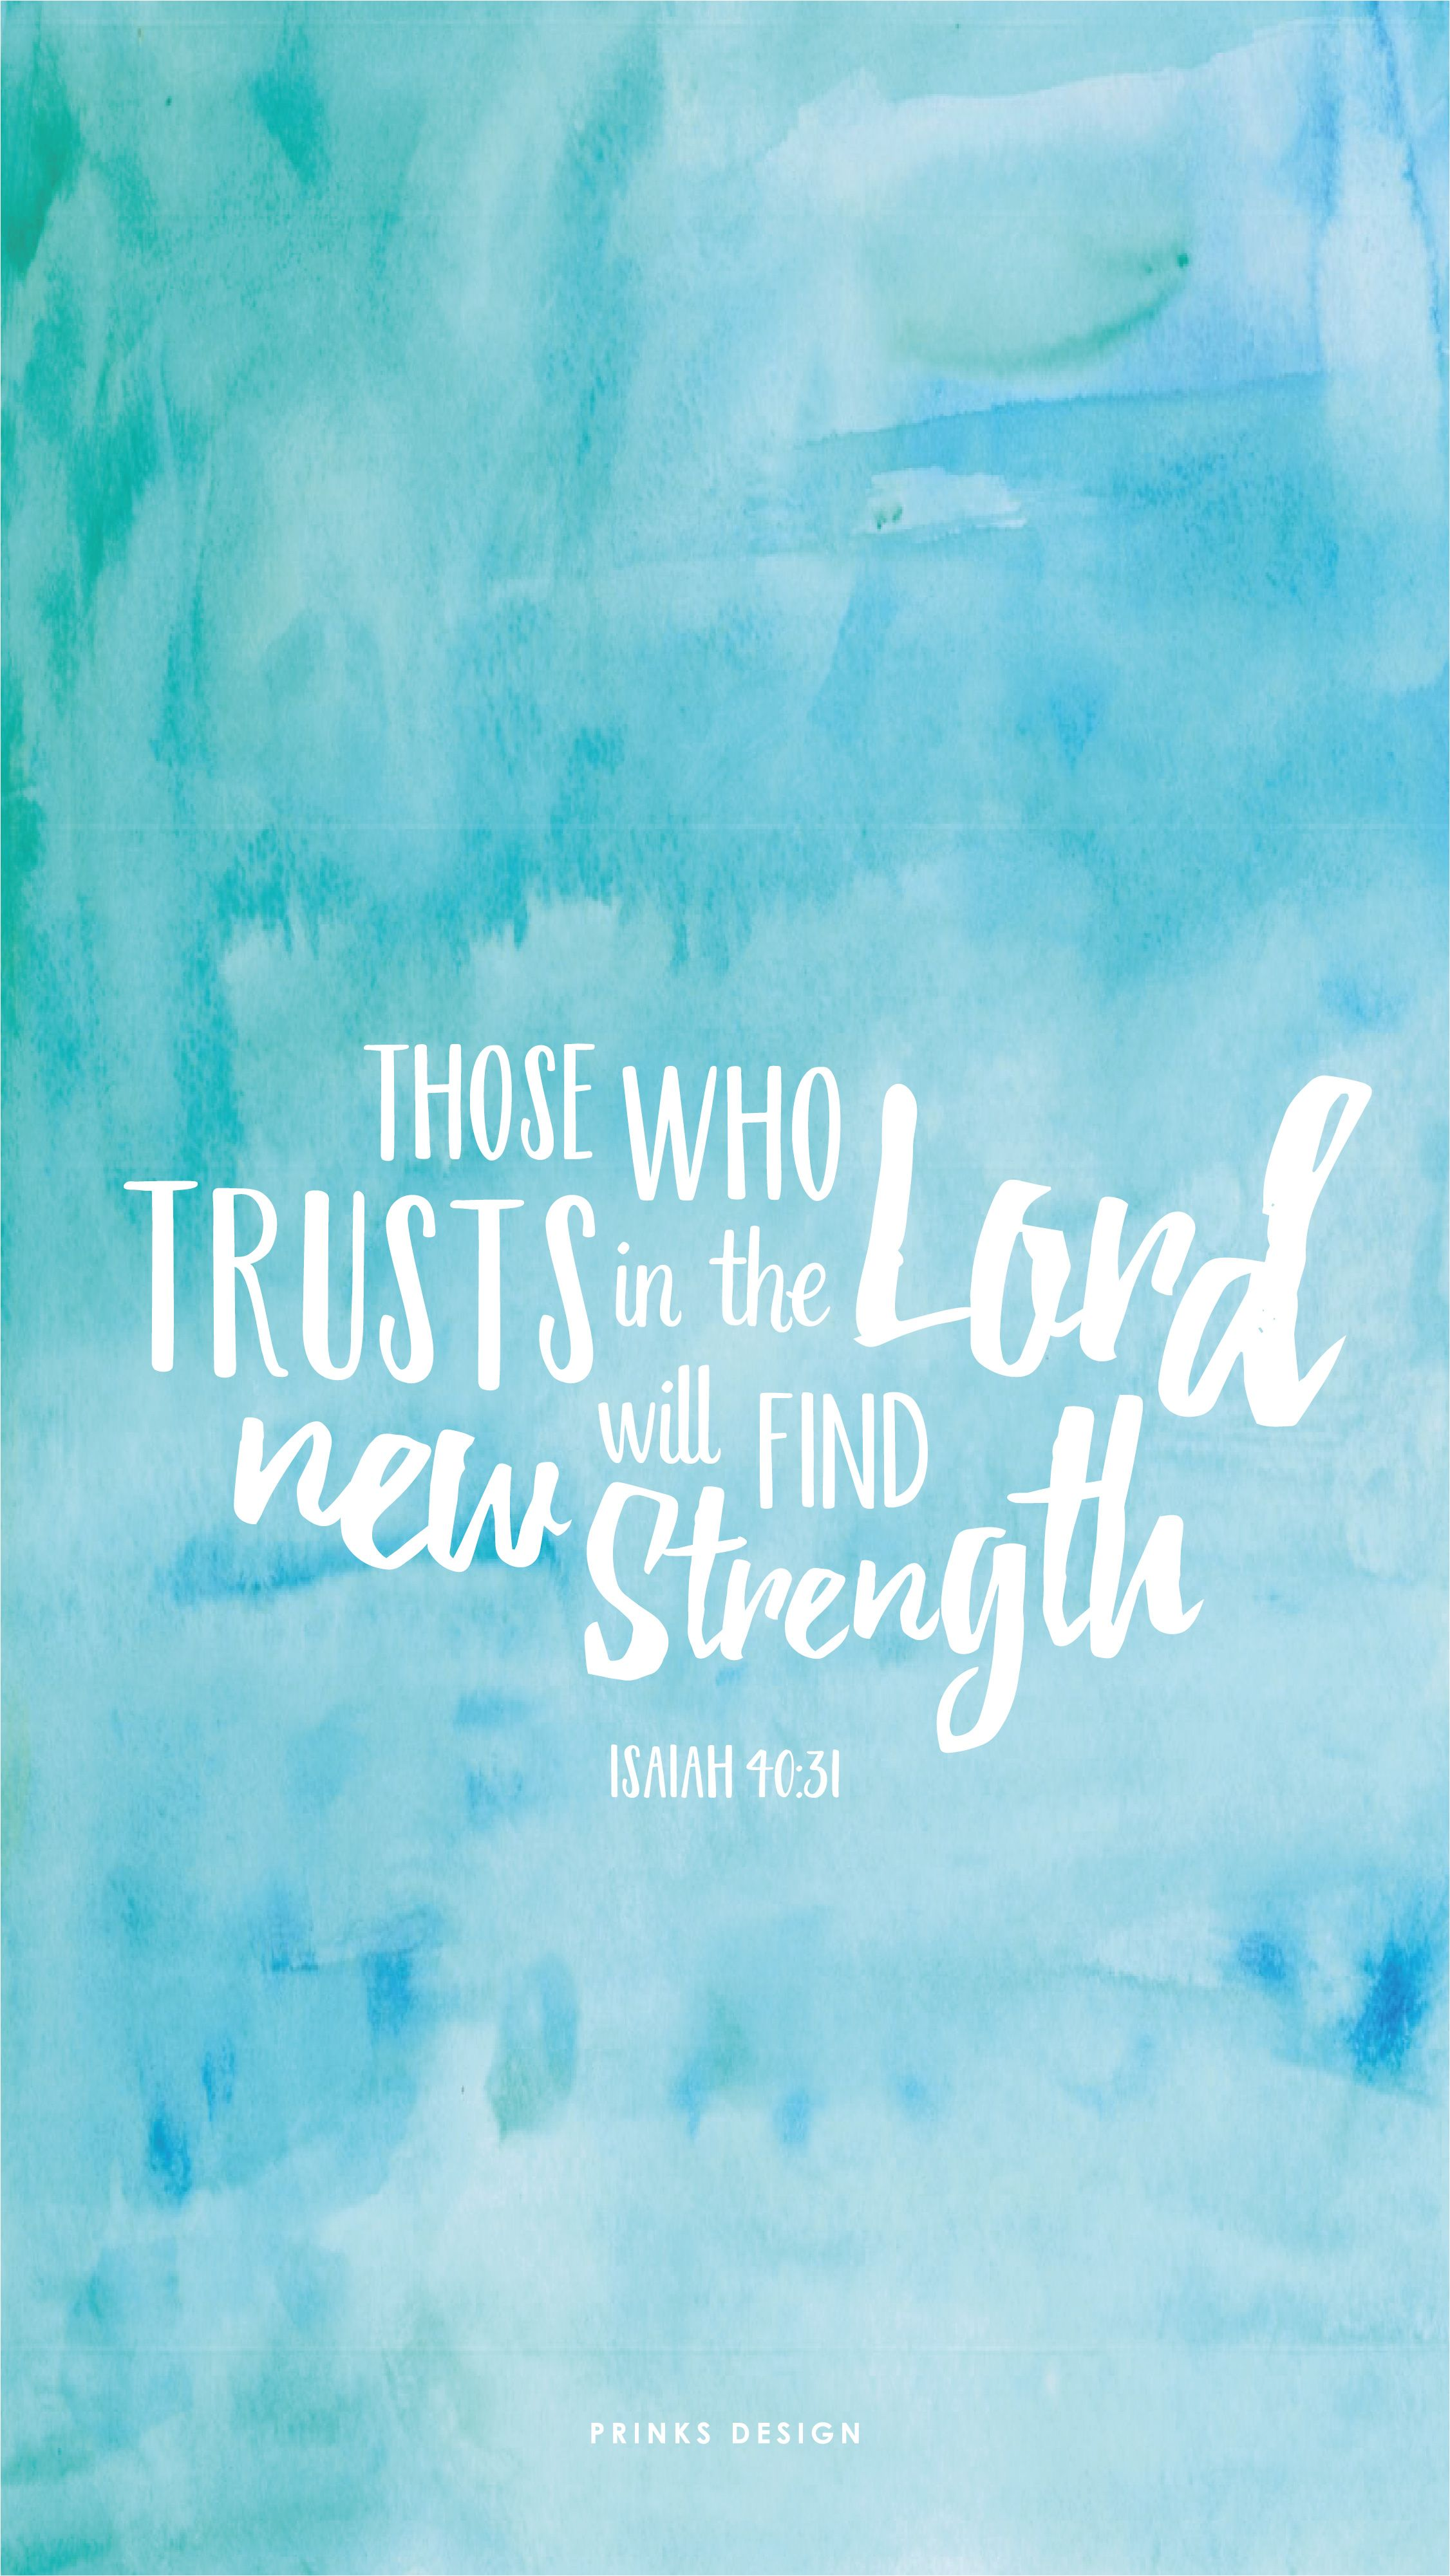 freebiesfriday bible verse book of isaiah strength 2252x4002